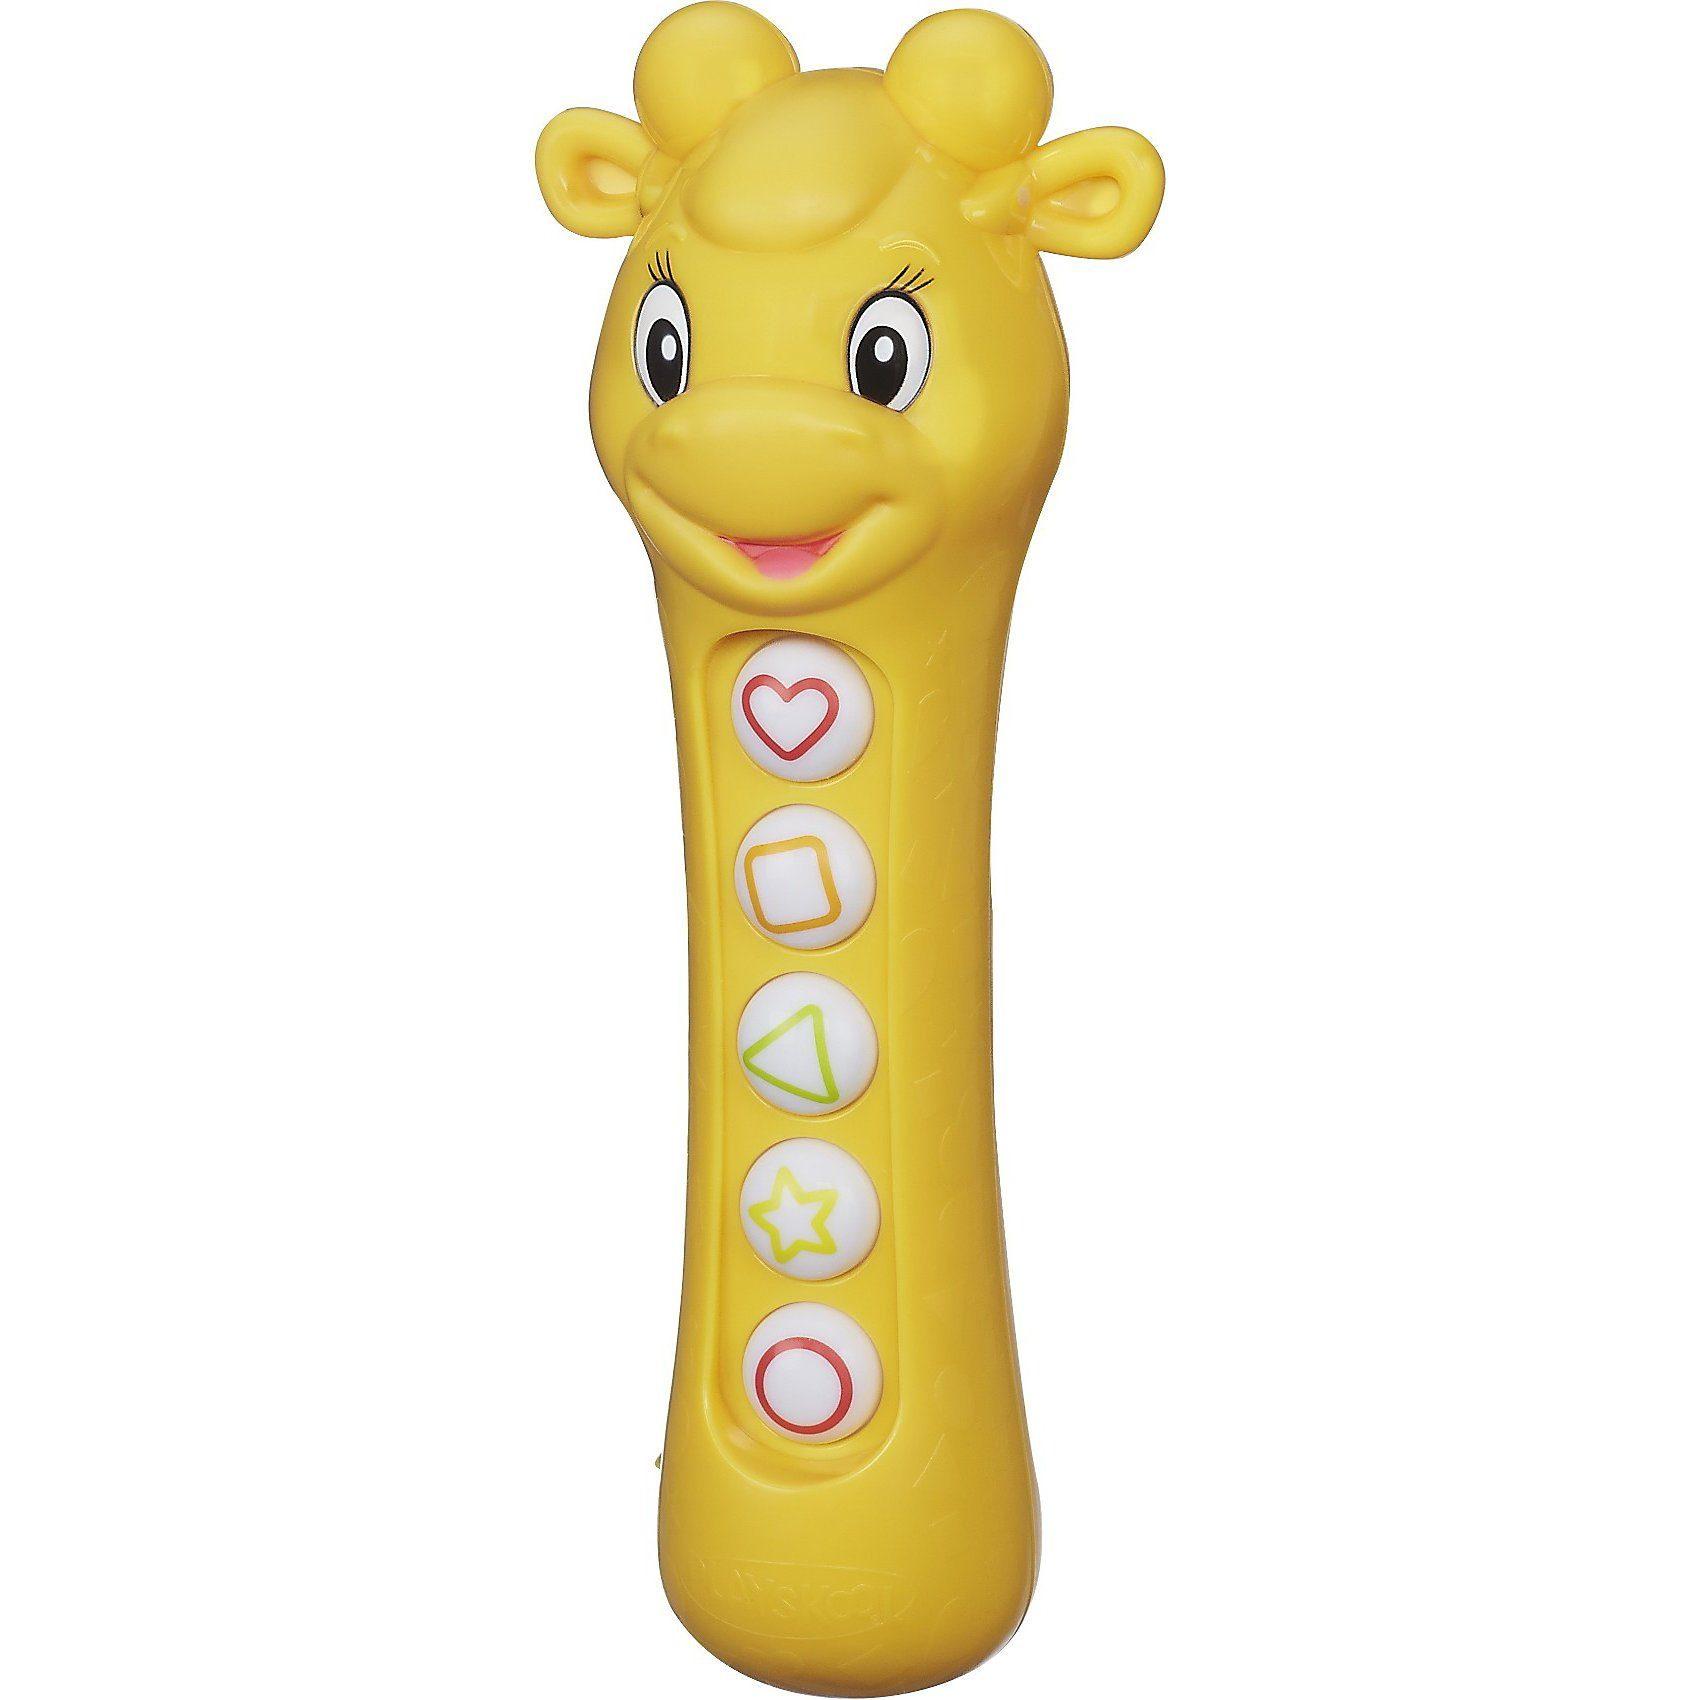 Hasbro Playskool - Leuchtspaß Giraffe